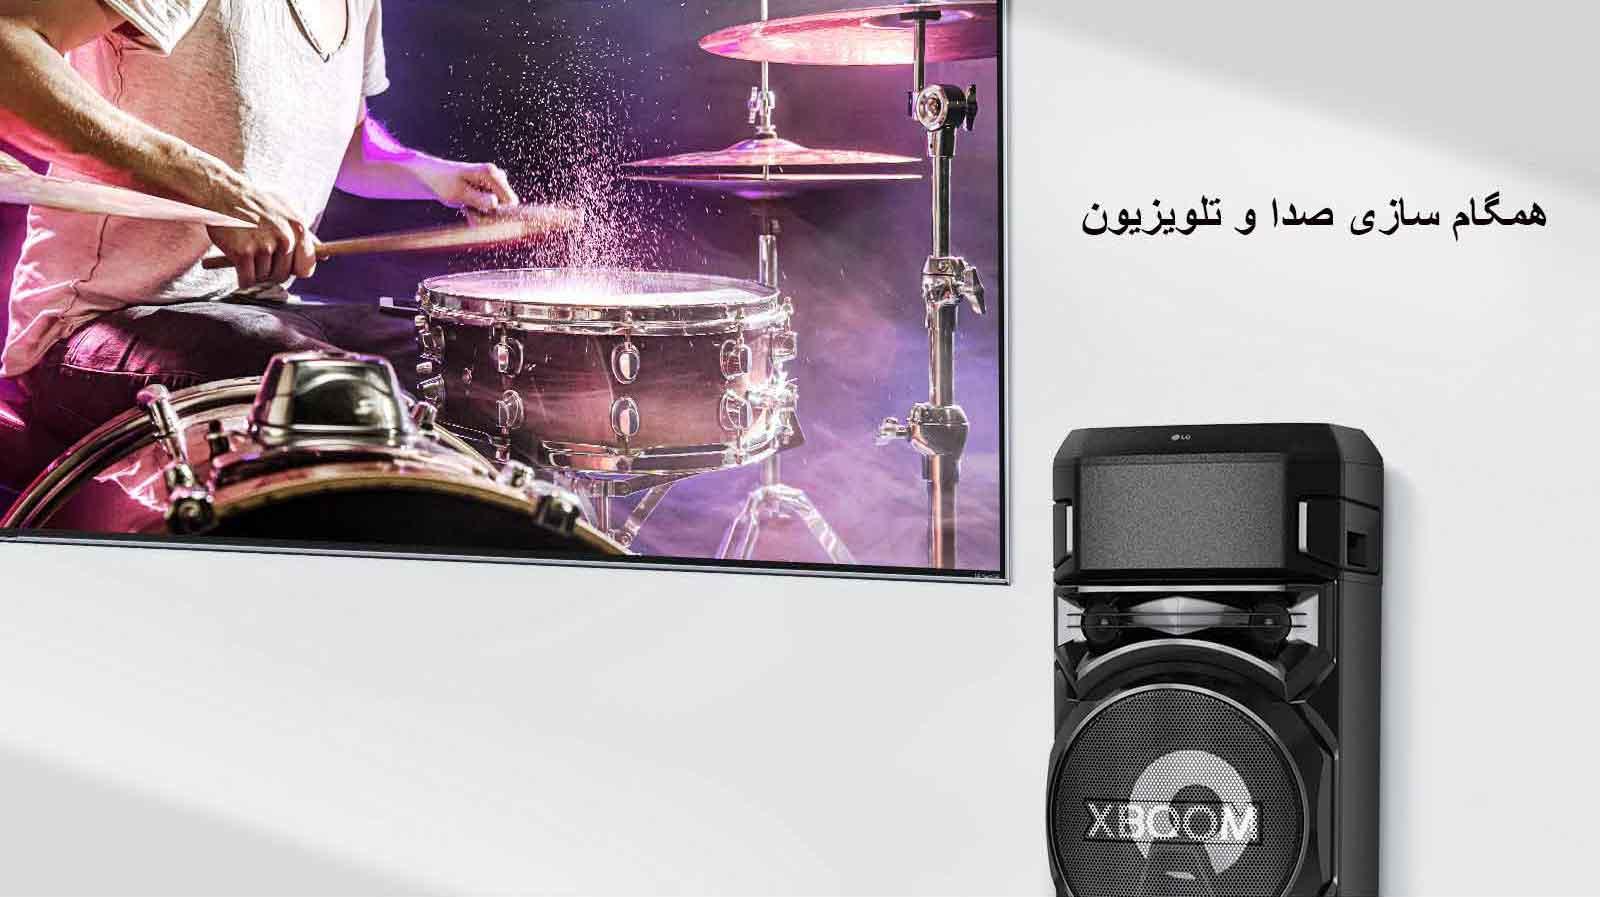 همگام سازی صدا و تلویزیون سیستم صوتی ال جی rn5